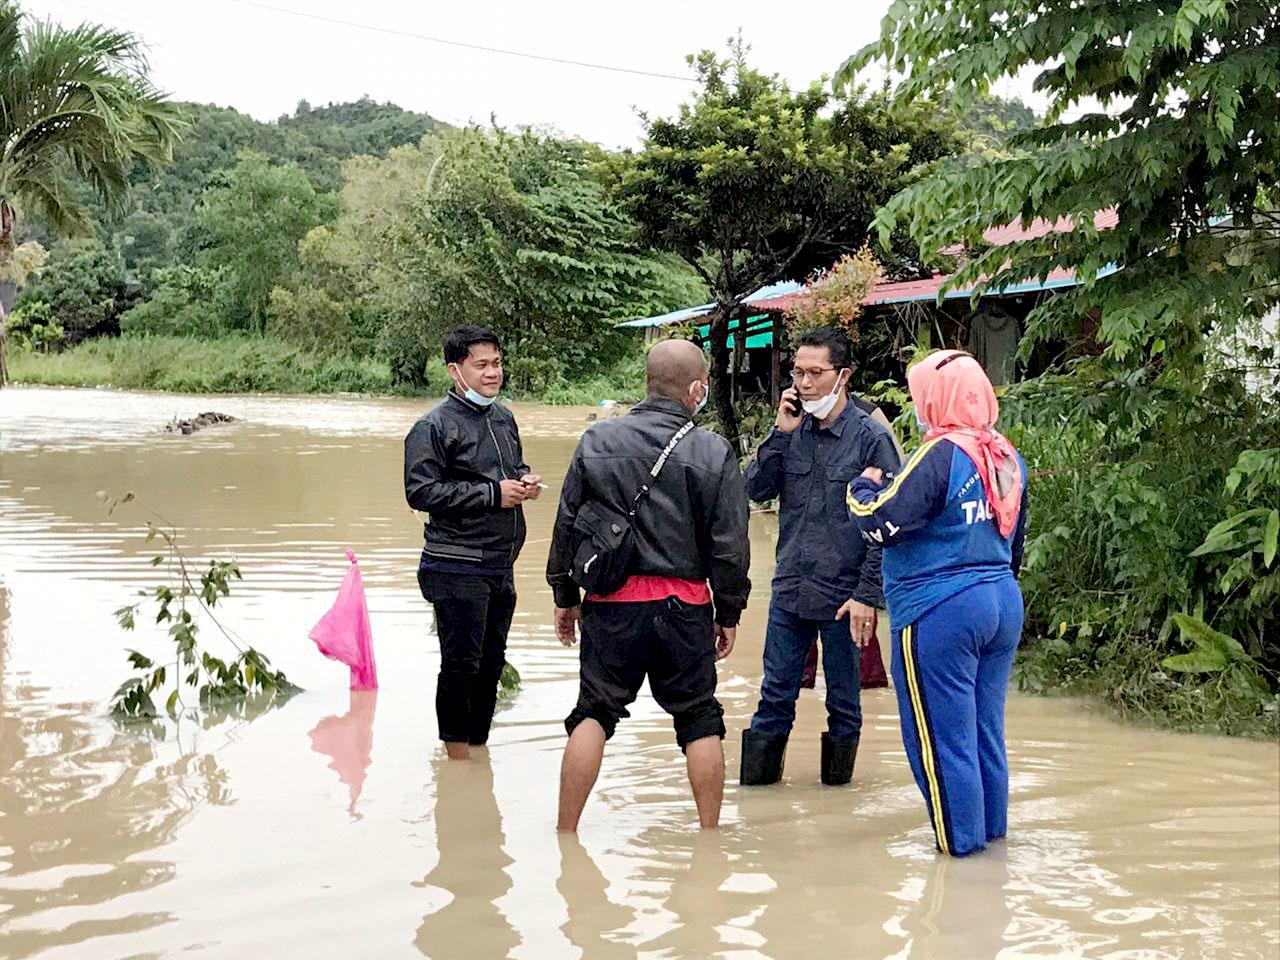 Wakil Walikota Batam Intruksikan Bawahannya Untuk Monitoring dan Turun meninjau Masyarakat Yang Terdampak Banjir